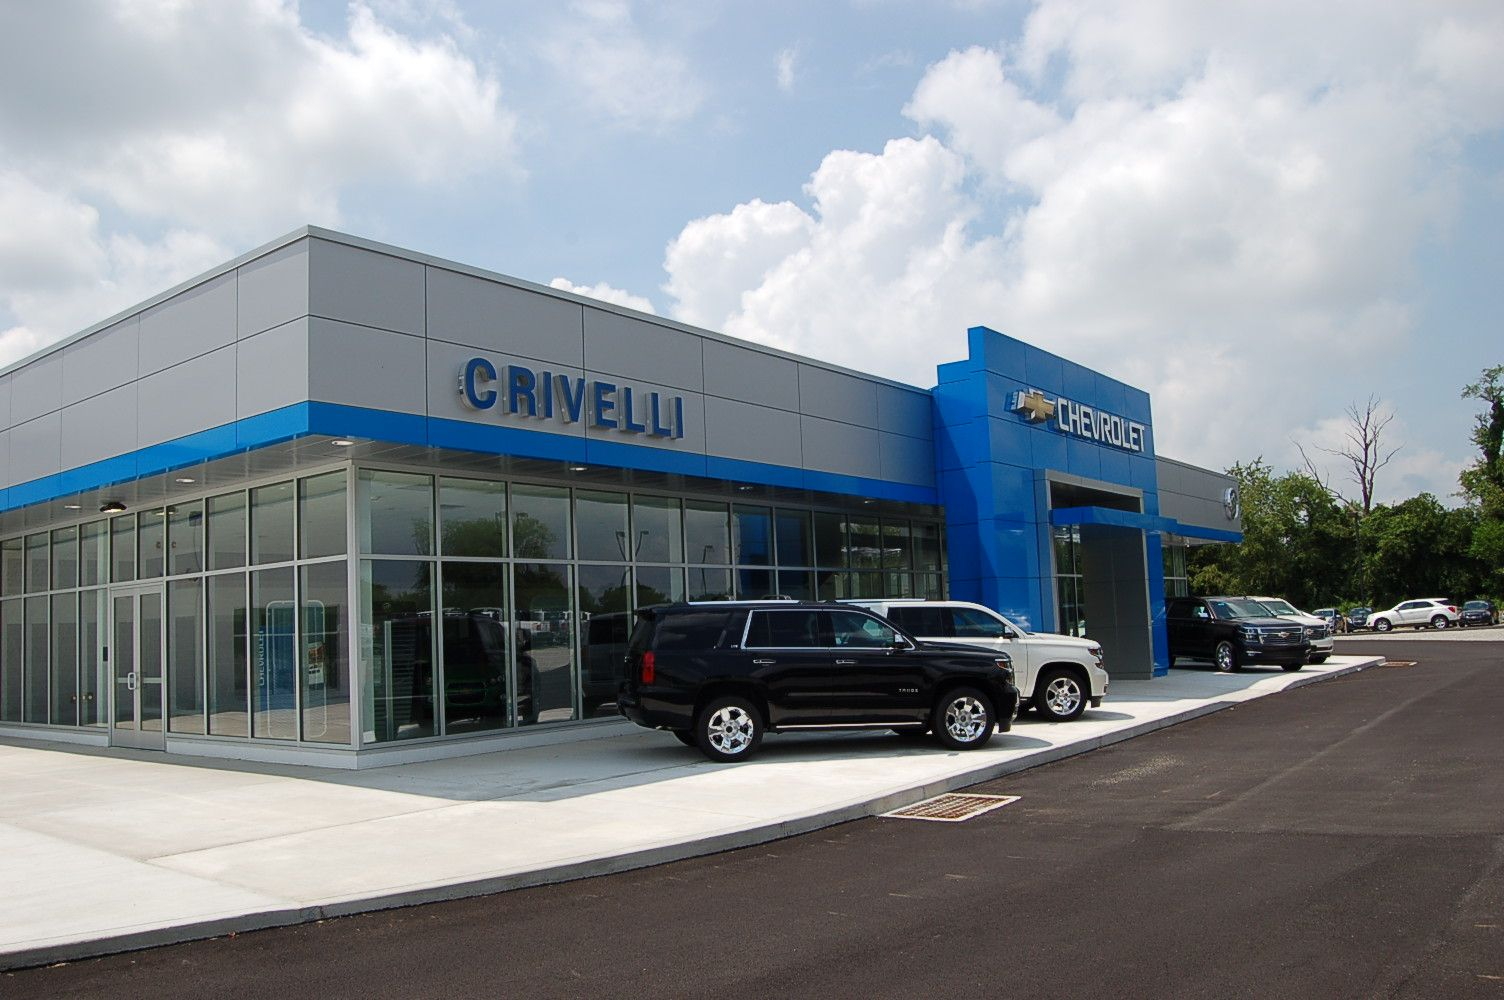 Crivelli Chevrolet Buick Mt Pleasant Pa Car Dealership Construction Process Corporate Design